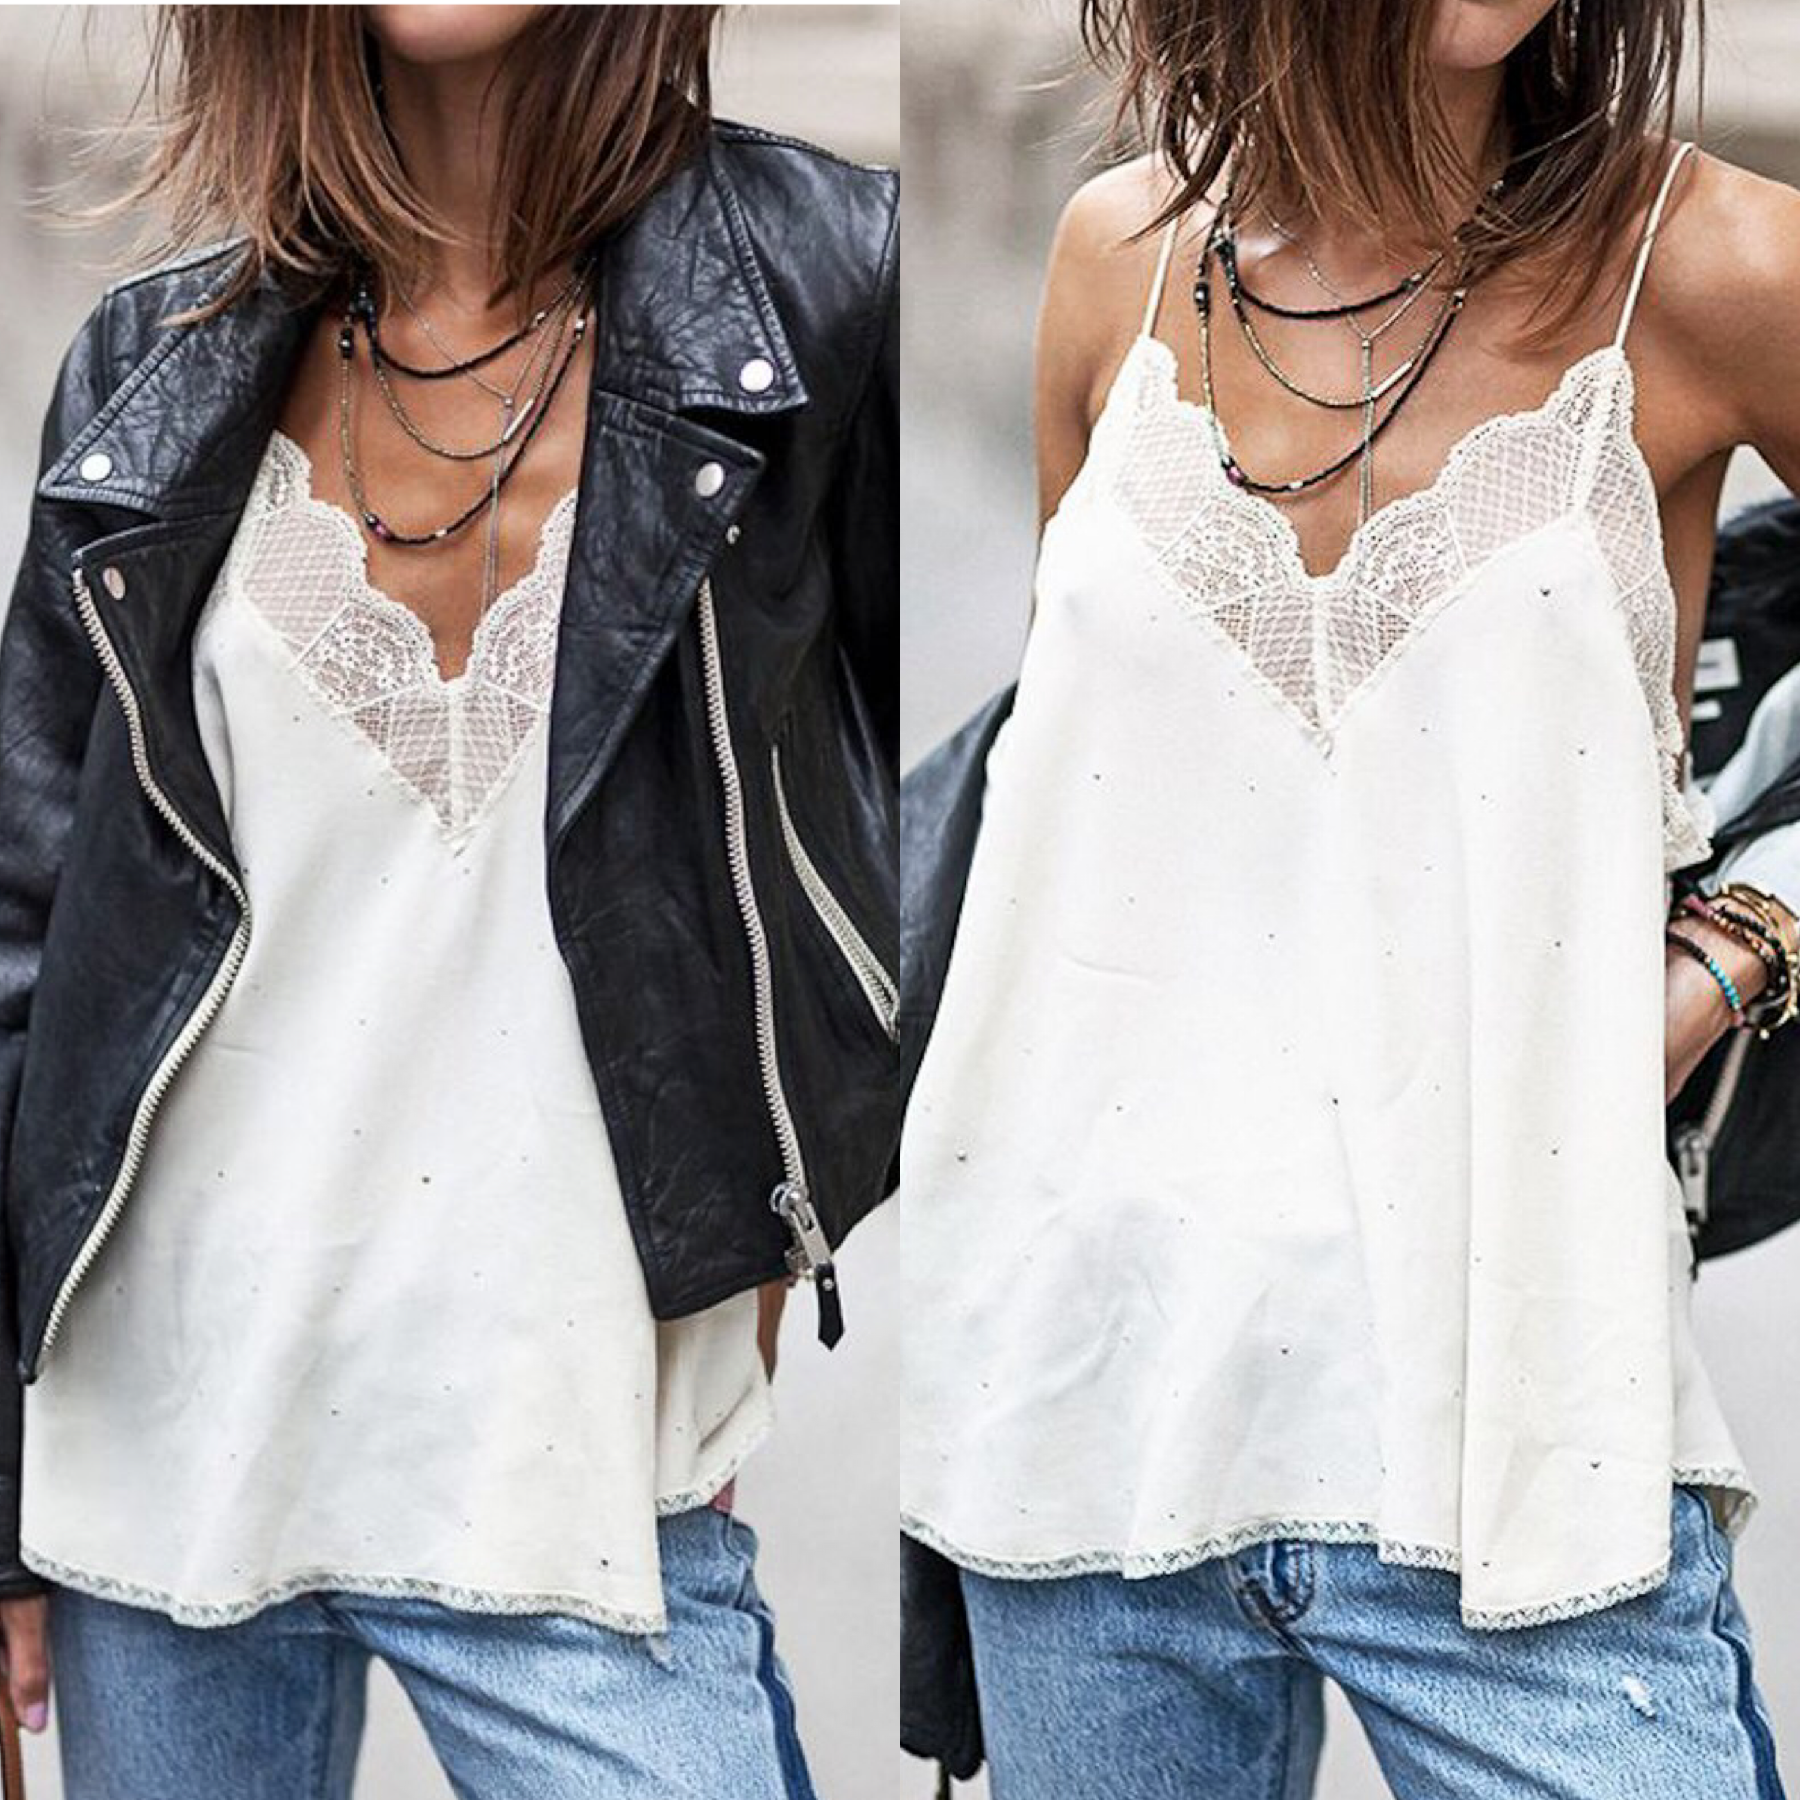 Stud Lace Detail Camisole